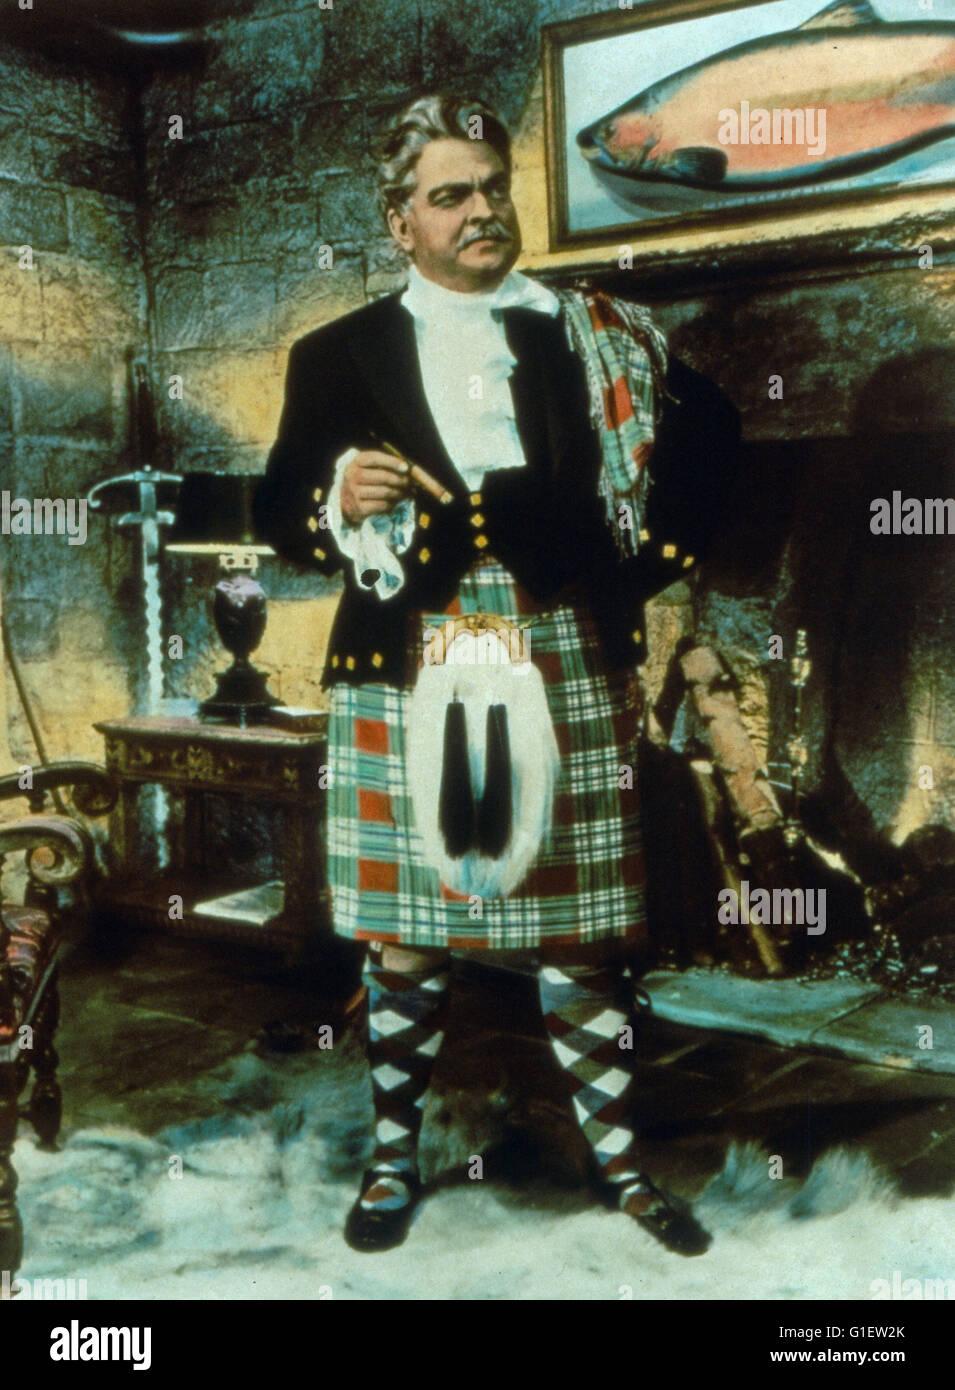 Trouble in the Glen, aka: Scherereien mit seiner Lordschaft, Großbritannien 1954, Regie: Herbert Wilcox, Darsteller: - Stock Image